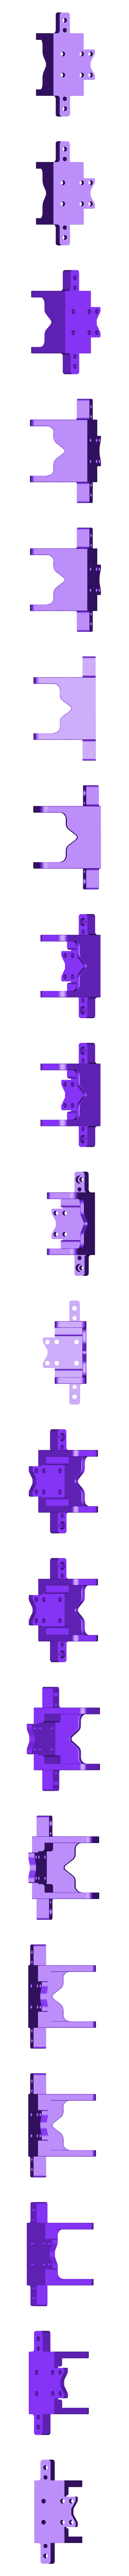 XV-JS21 PREDNI PAROHY.stl Download STL file TAMIYA XV-01 RC RALLY CAR KIT model 2021 • 3D printing model, rctruckrallymodels